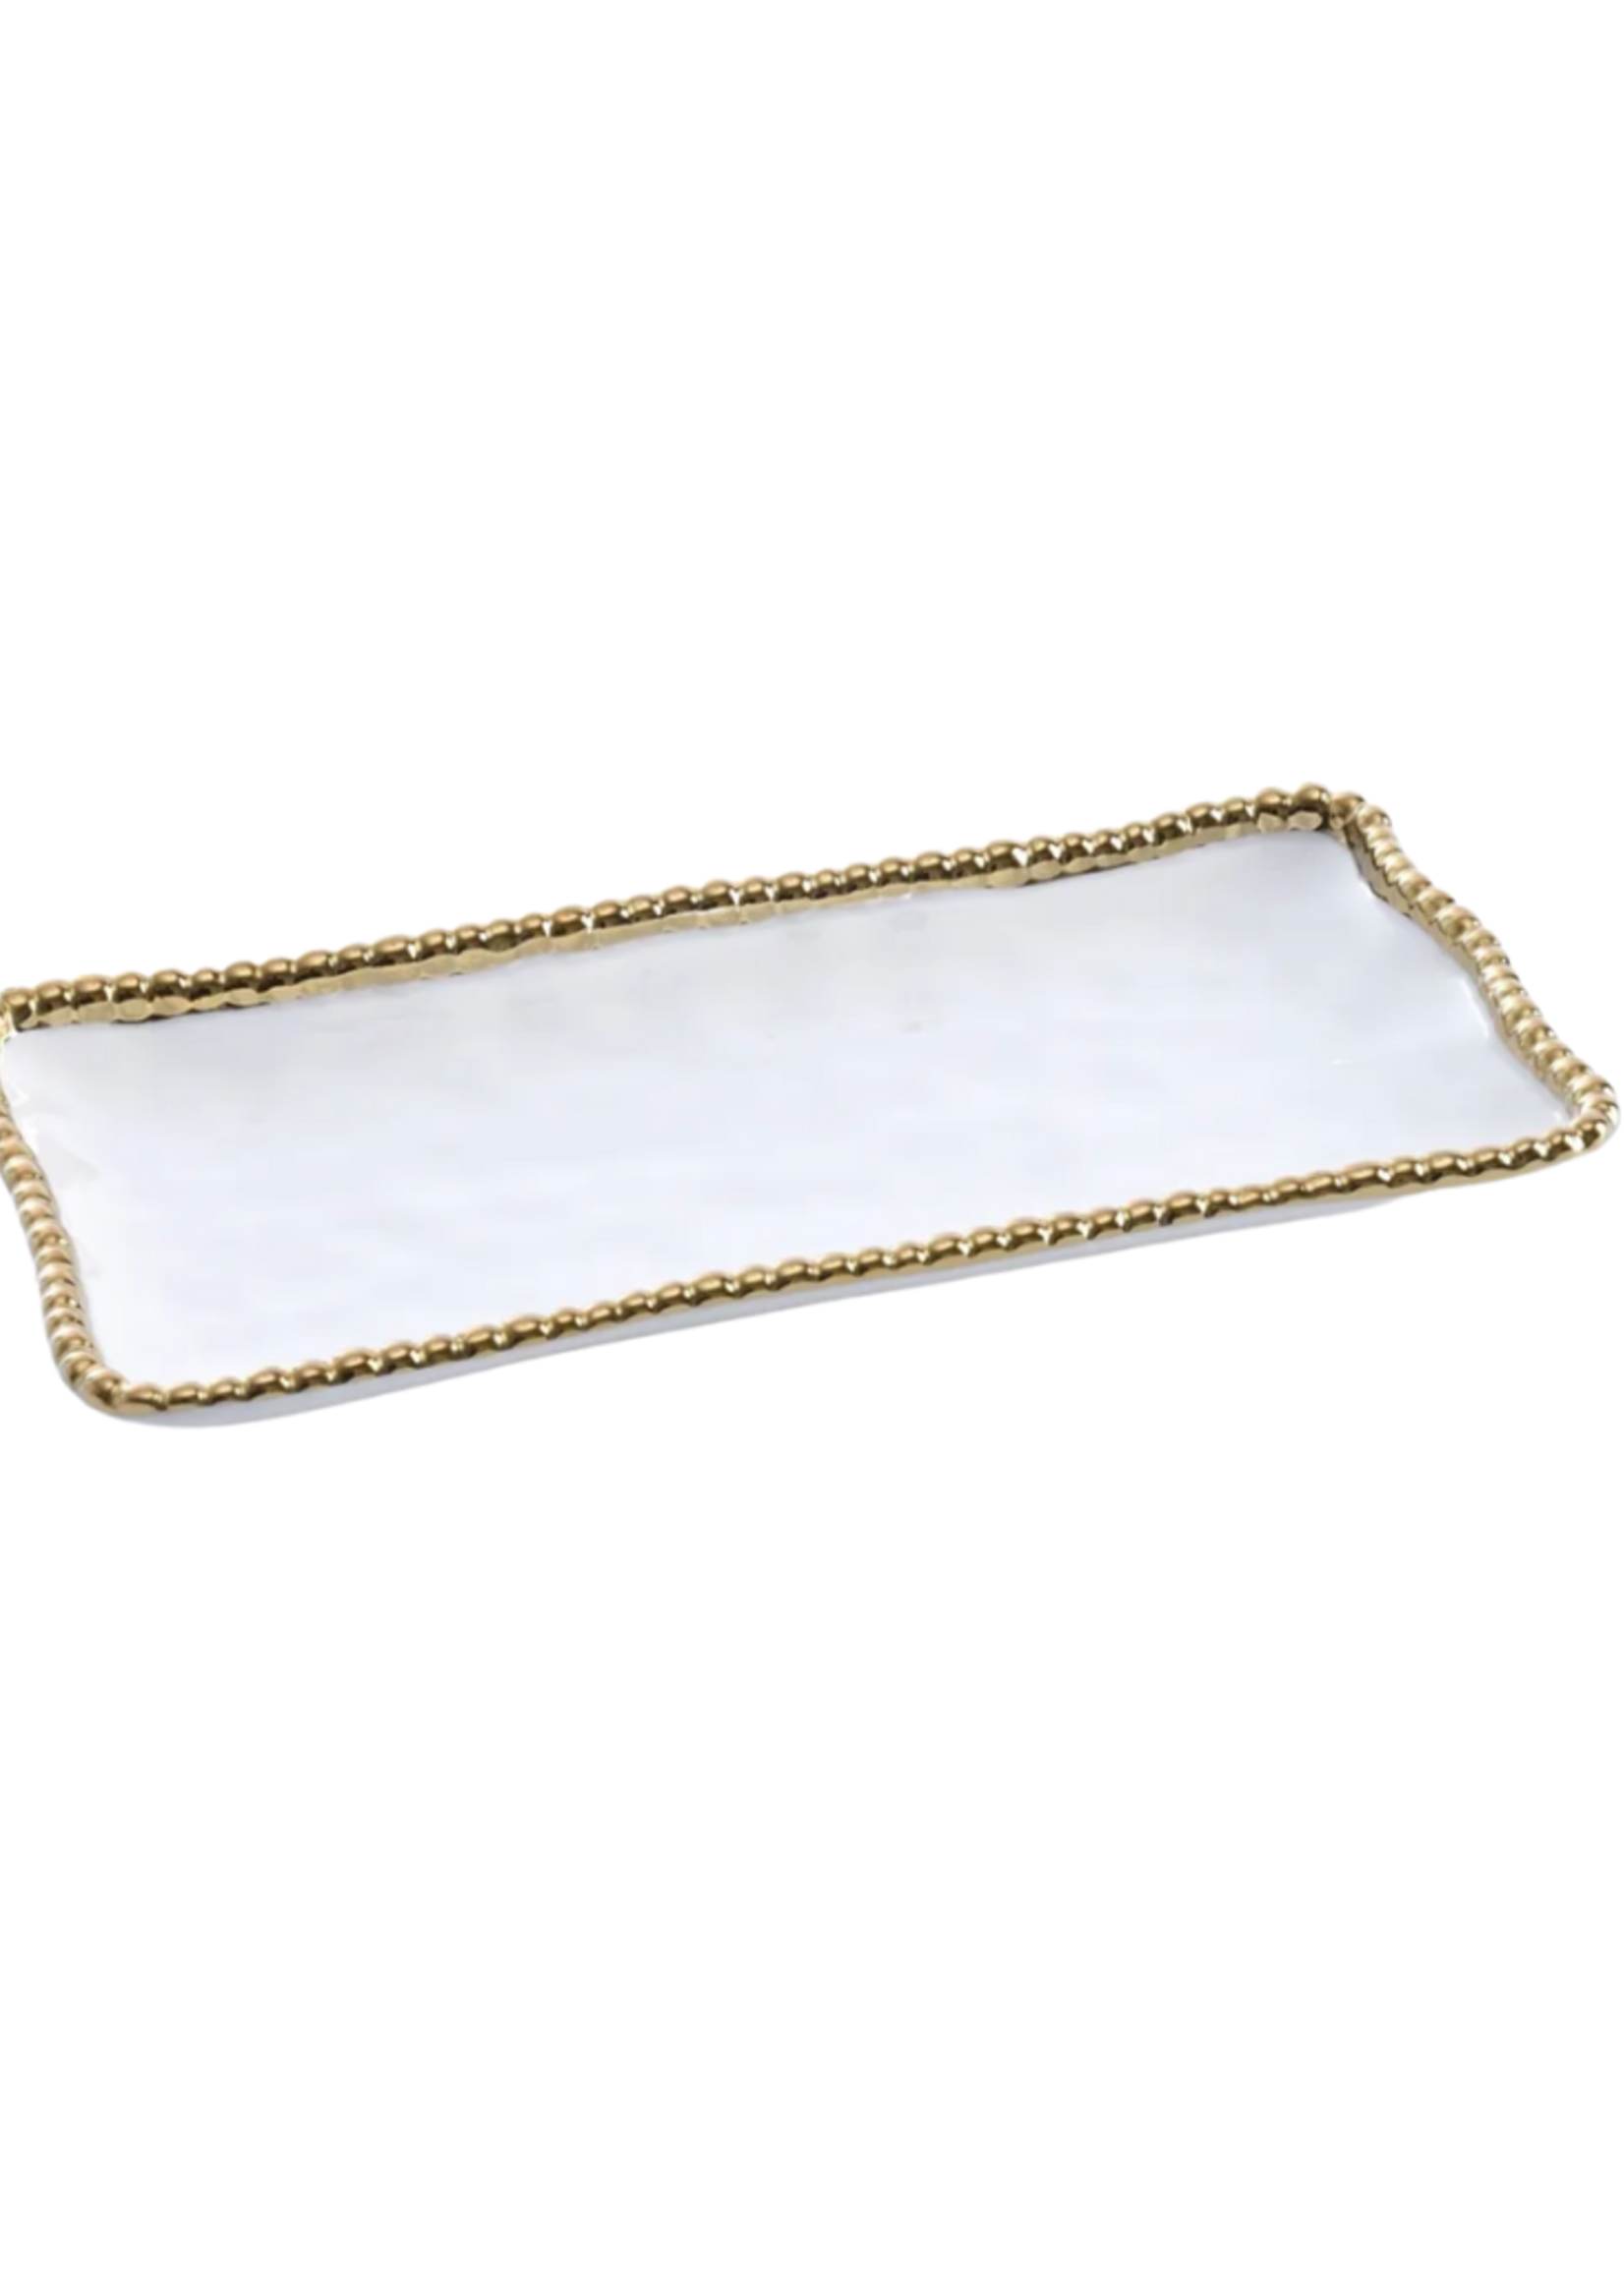 Small Rectangular Tray // White & Gold